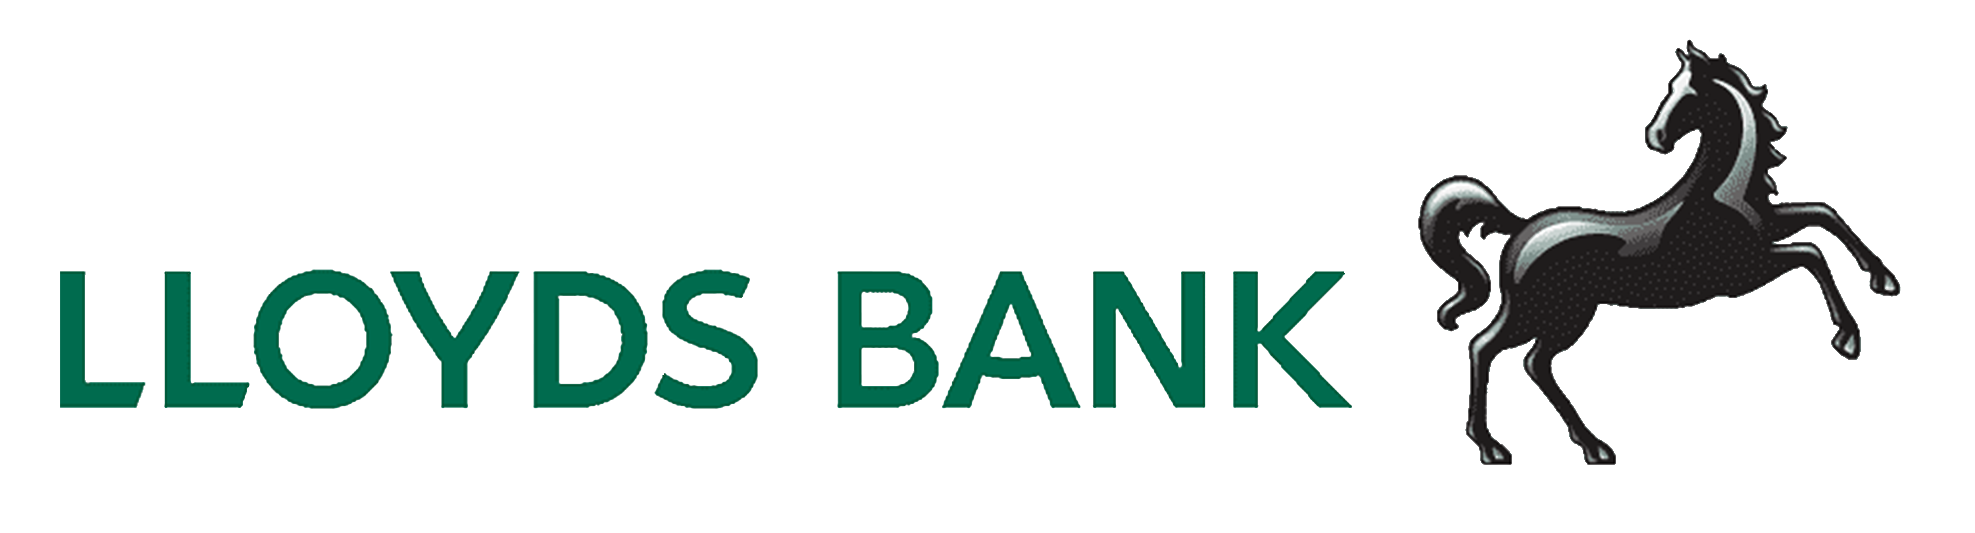 Lloyds Bank 2